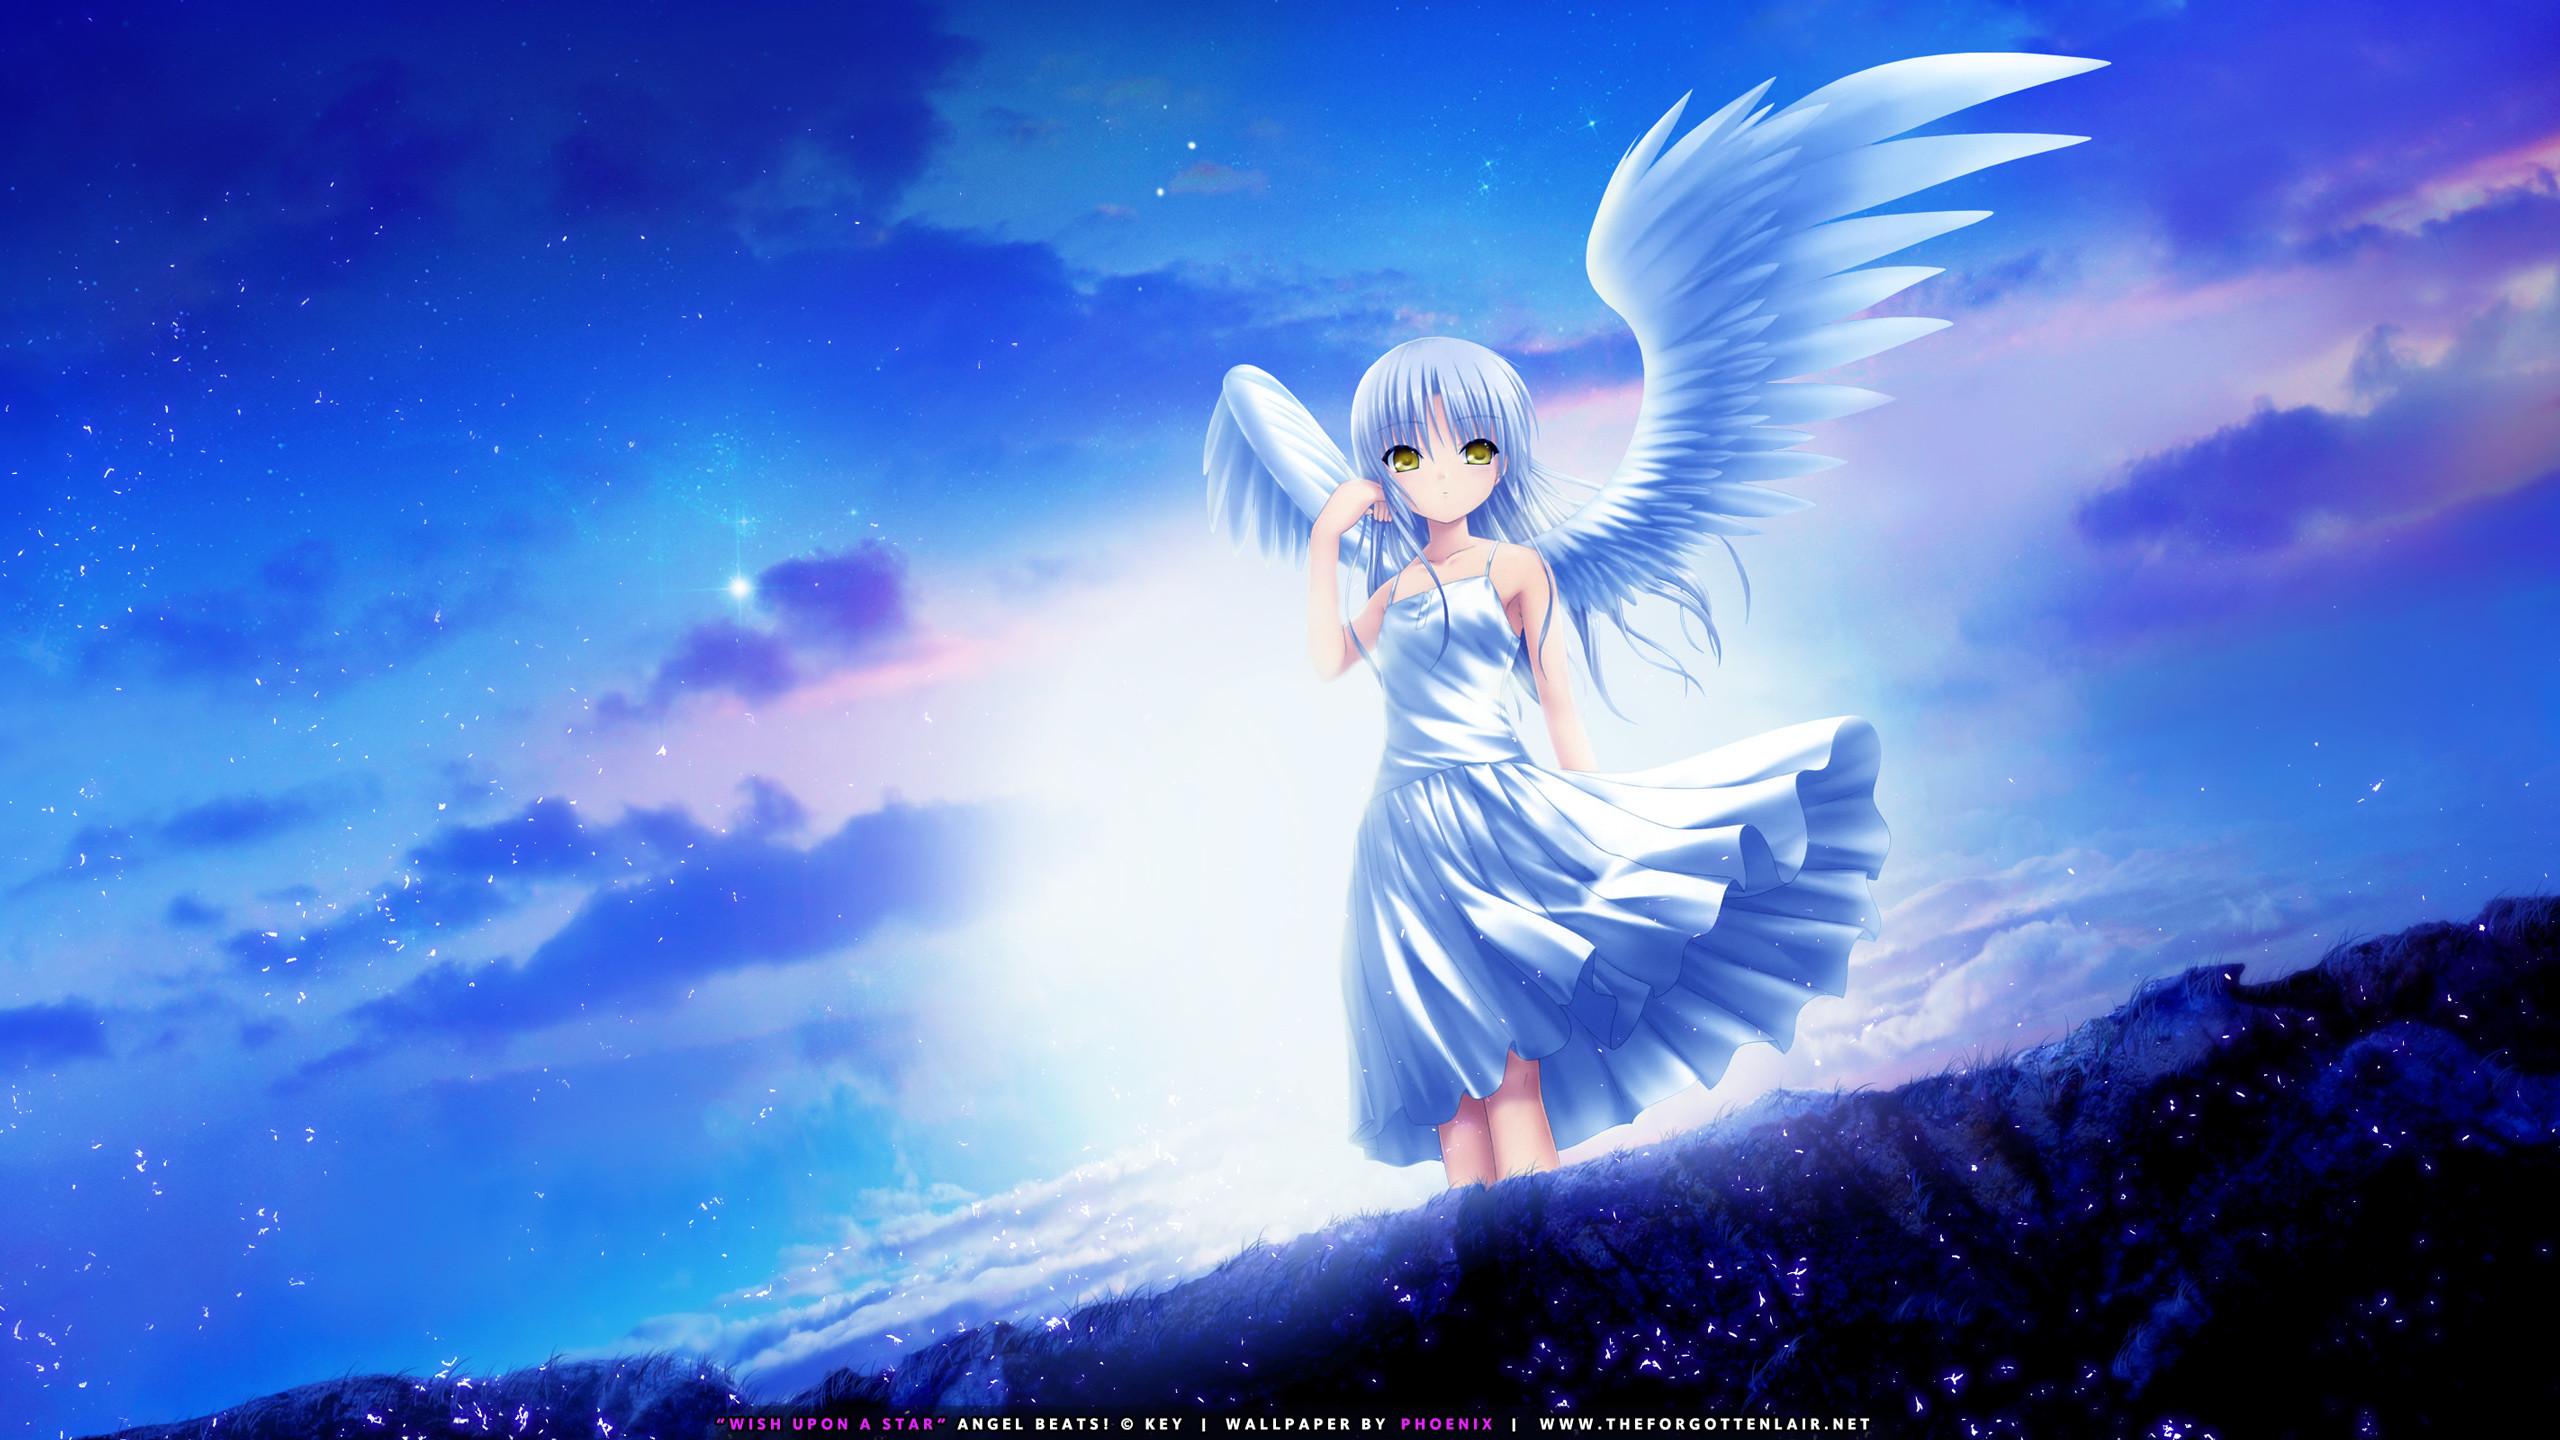 Cool Girl Saiyan Wallpaper Angel Desktop Wallpaper 58 Images